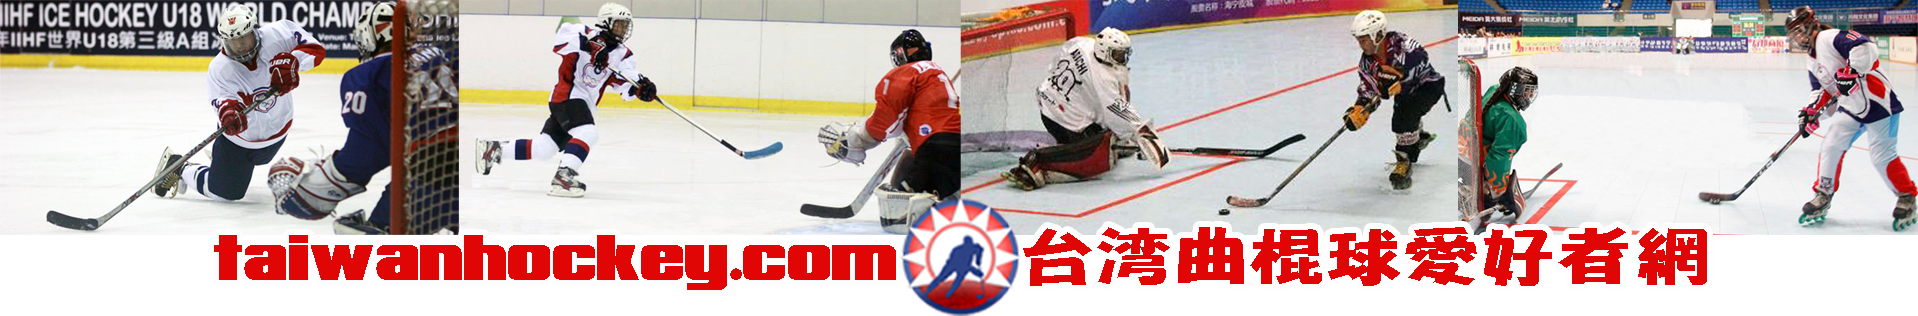 taiwanhockey.com